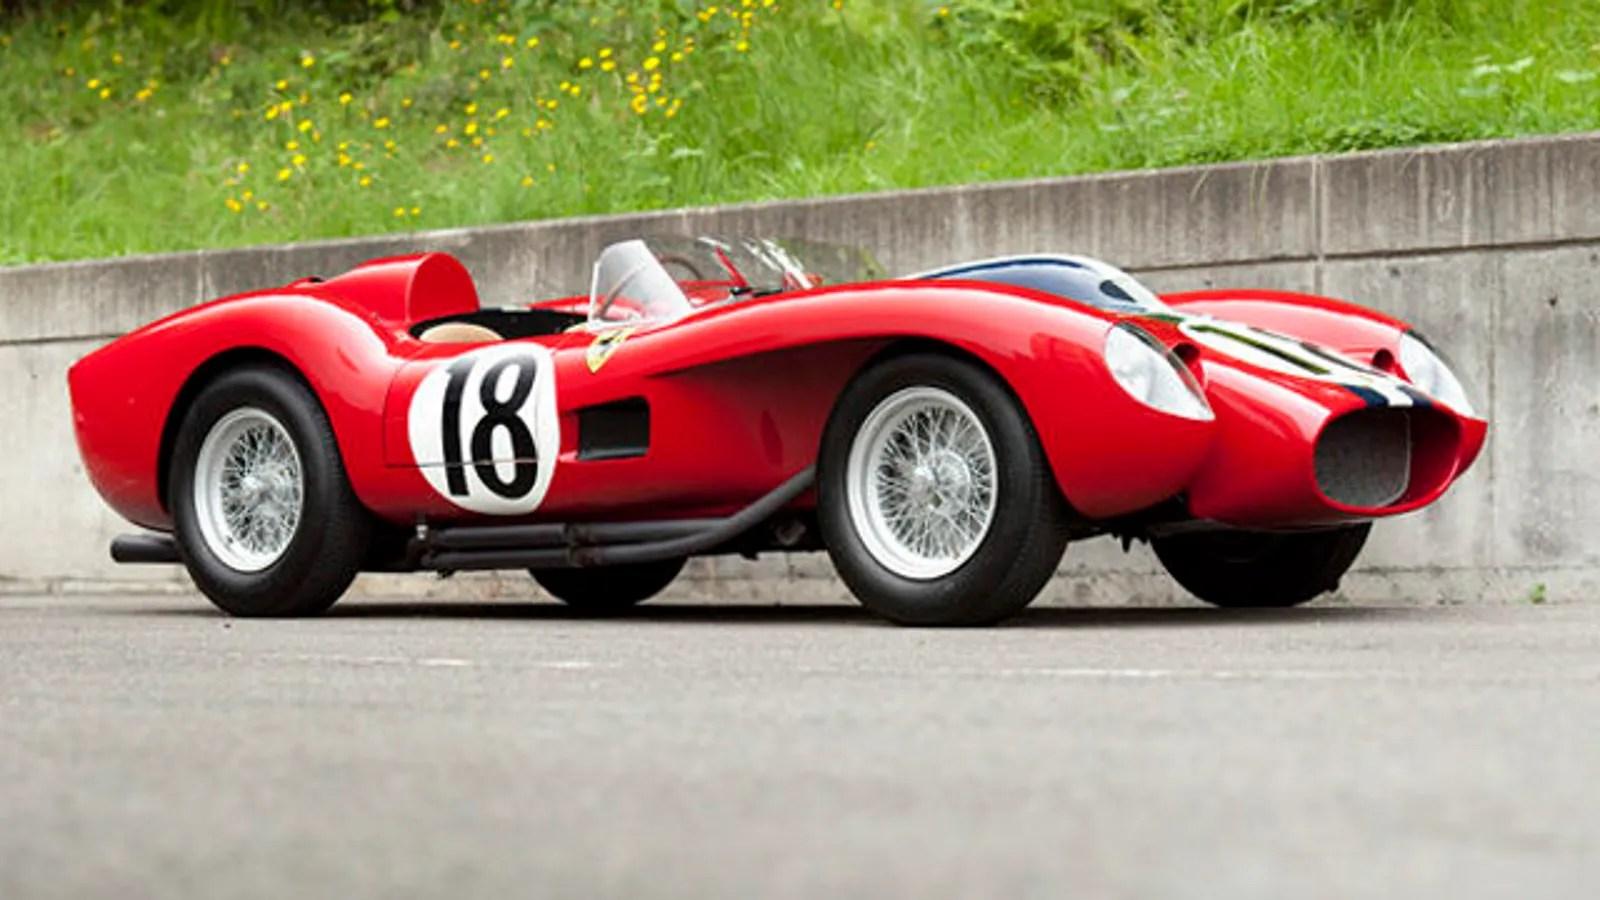 1957 Ferrari 250 Testa Rossa Prototype Becomes Most Expensive Car